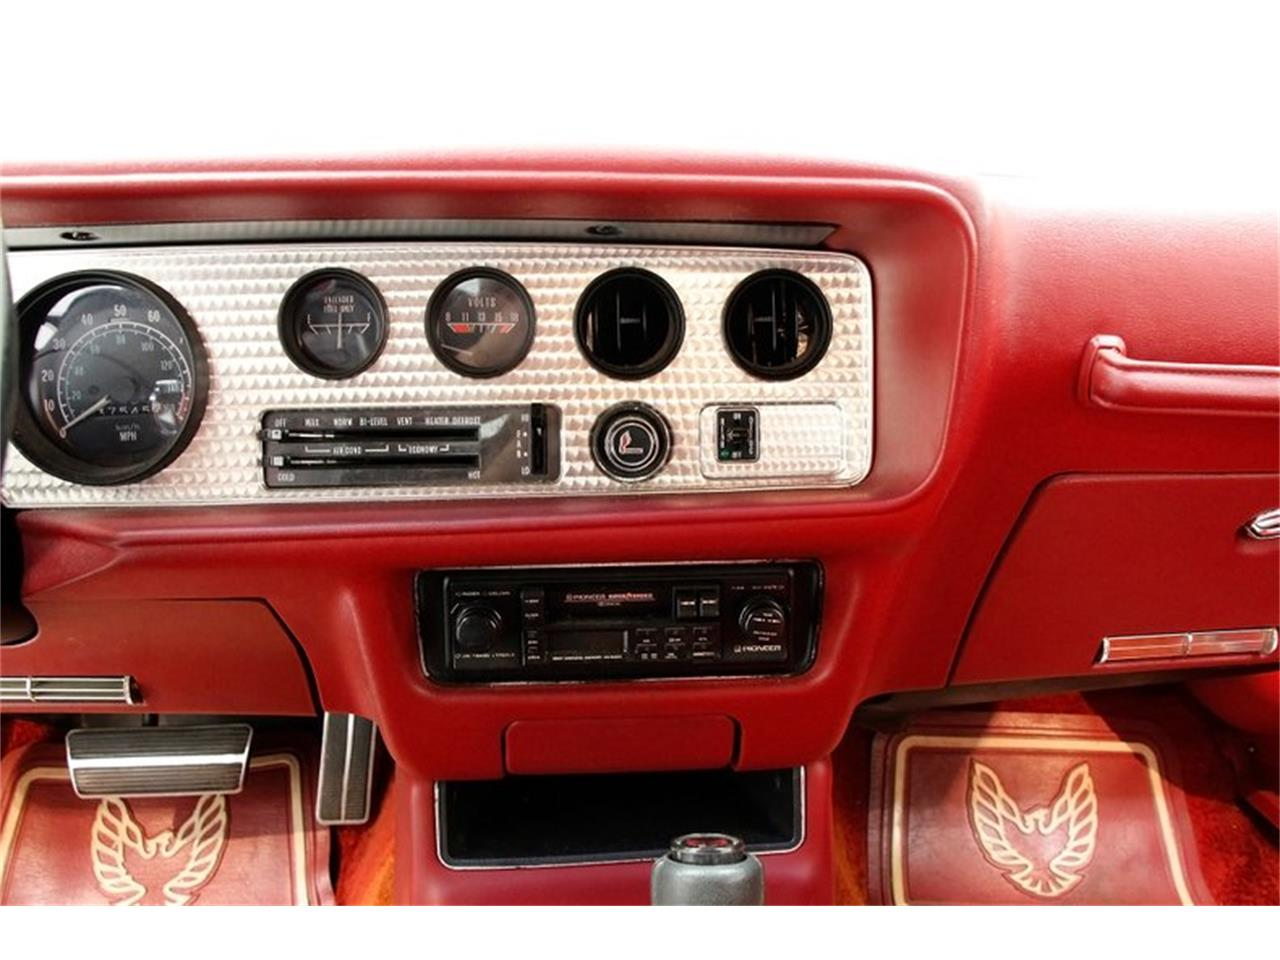 1978 Pontiac Firebird Trans Am (CC-1225216) for sale in Morgantown, Pennsylvania